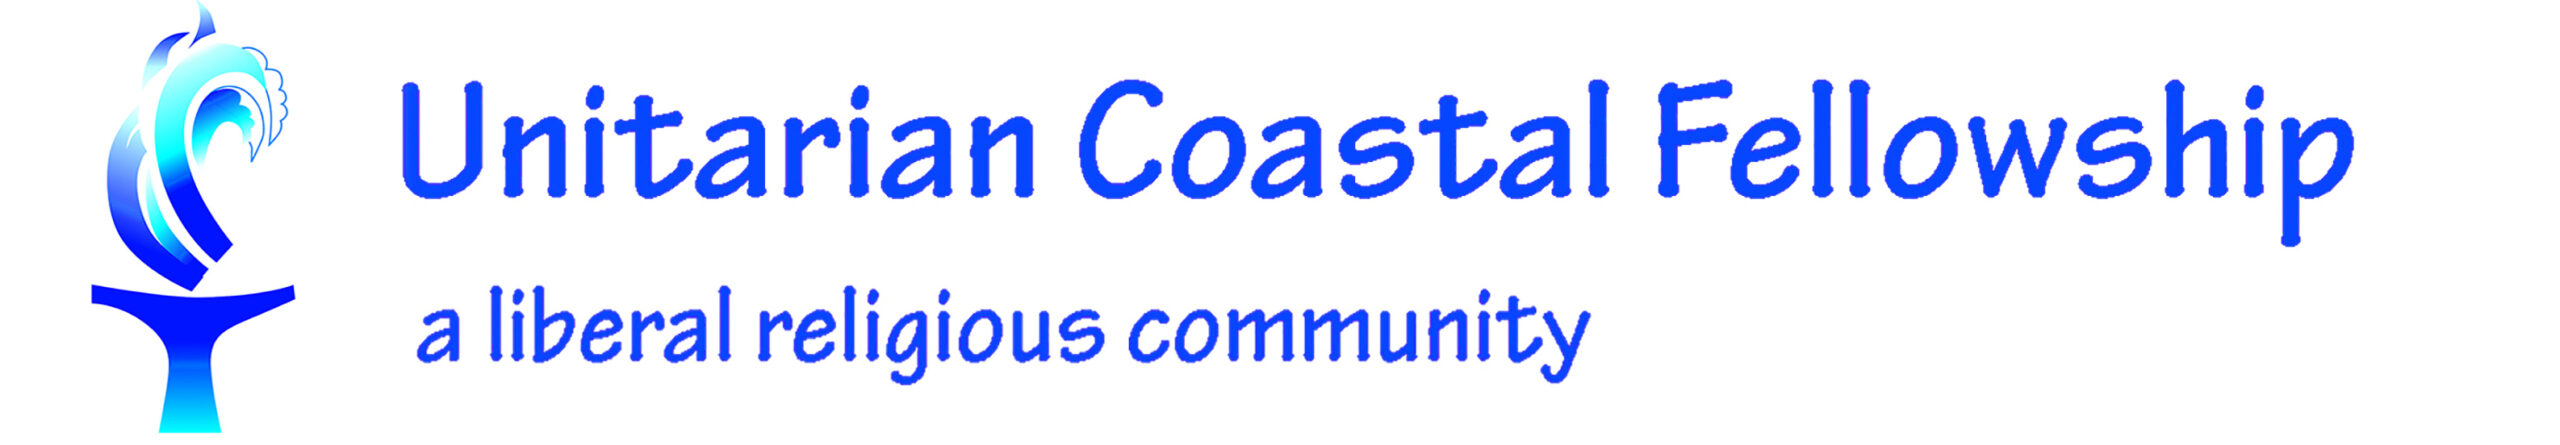 Unitarian Coastal Fellowship